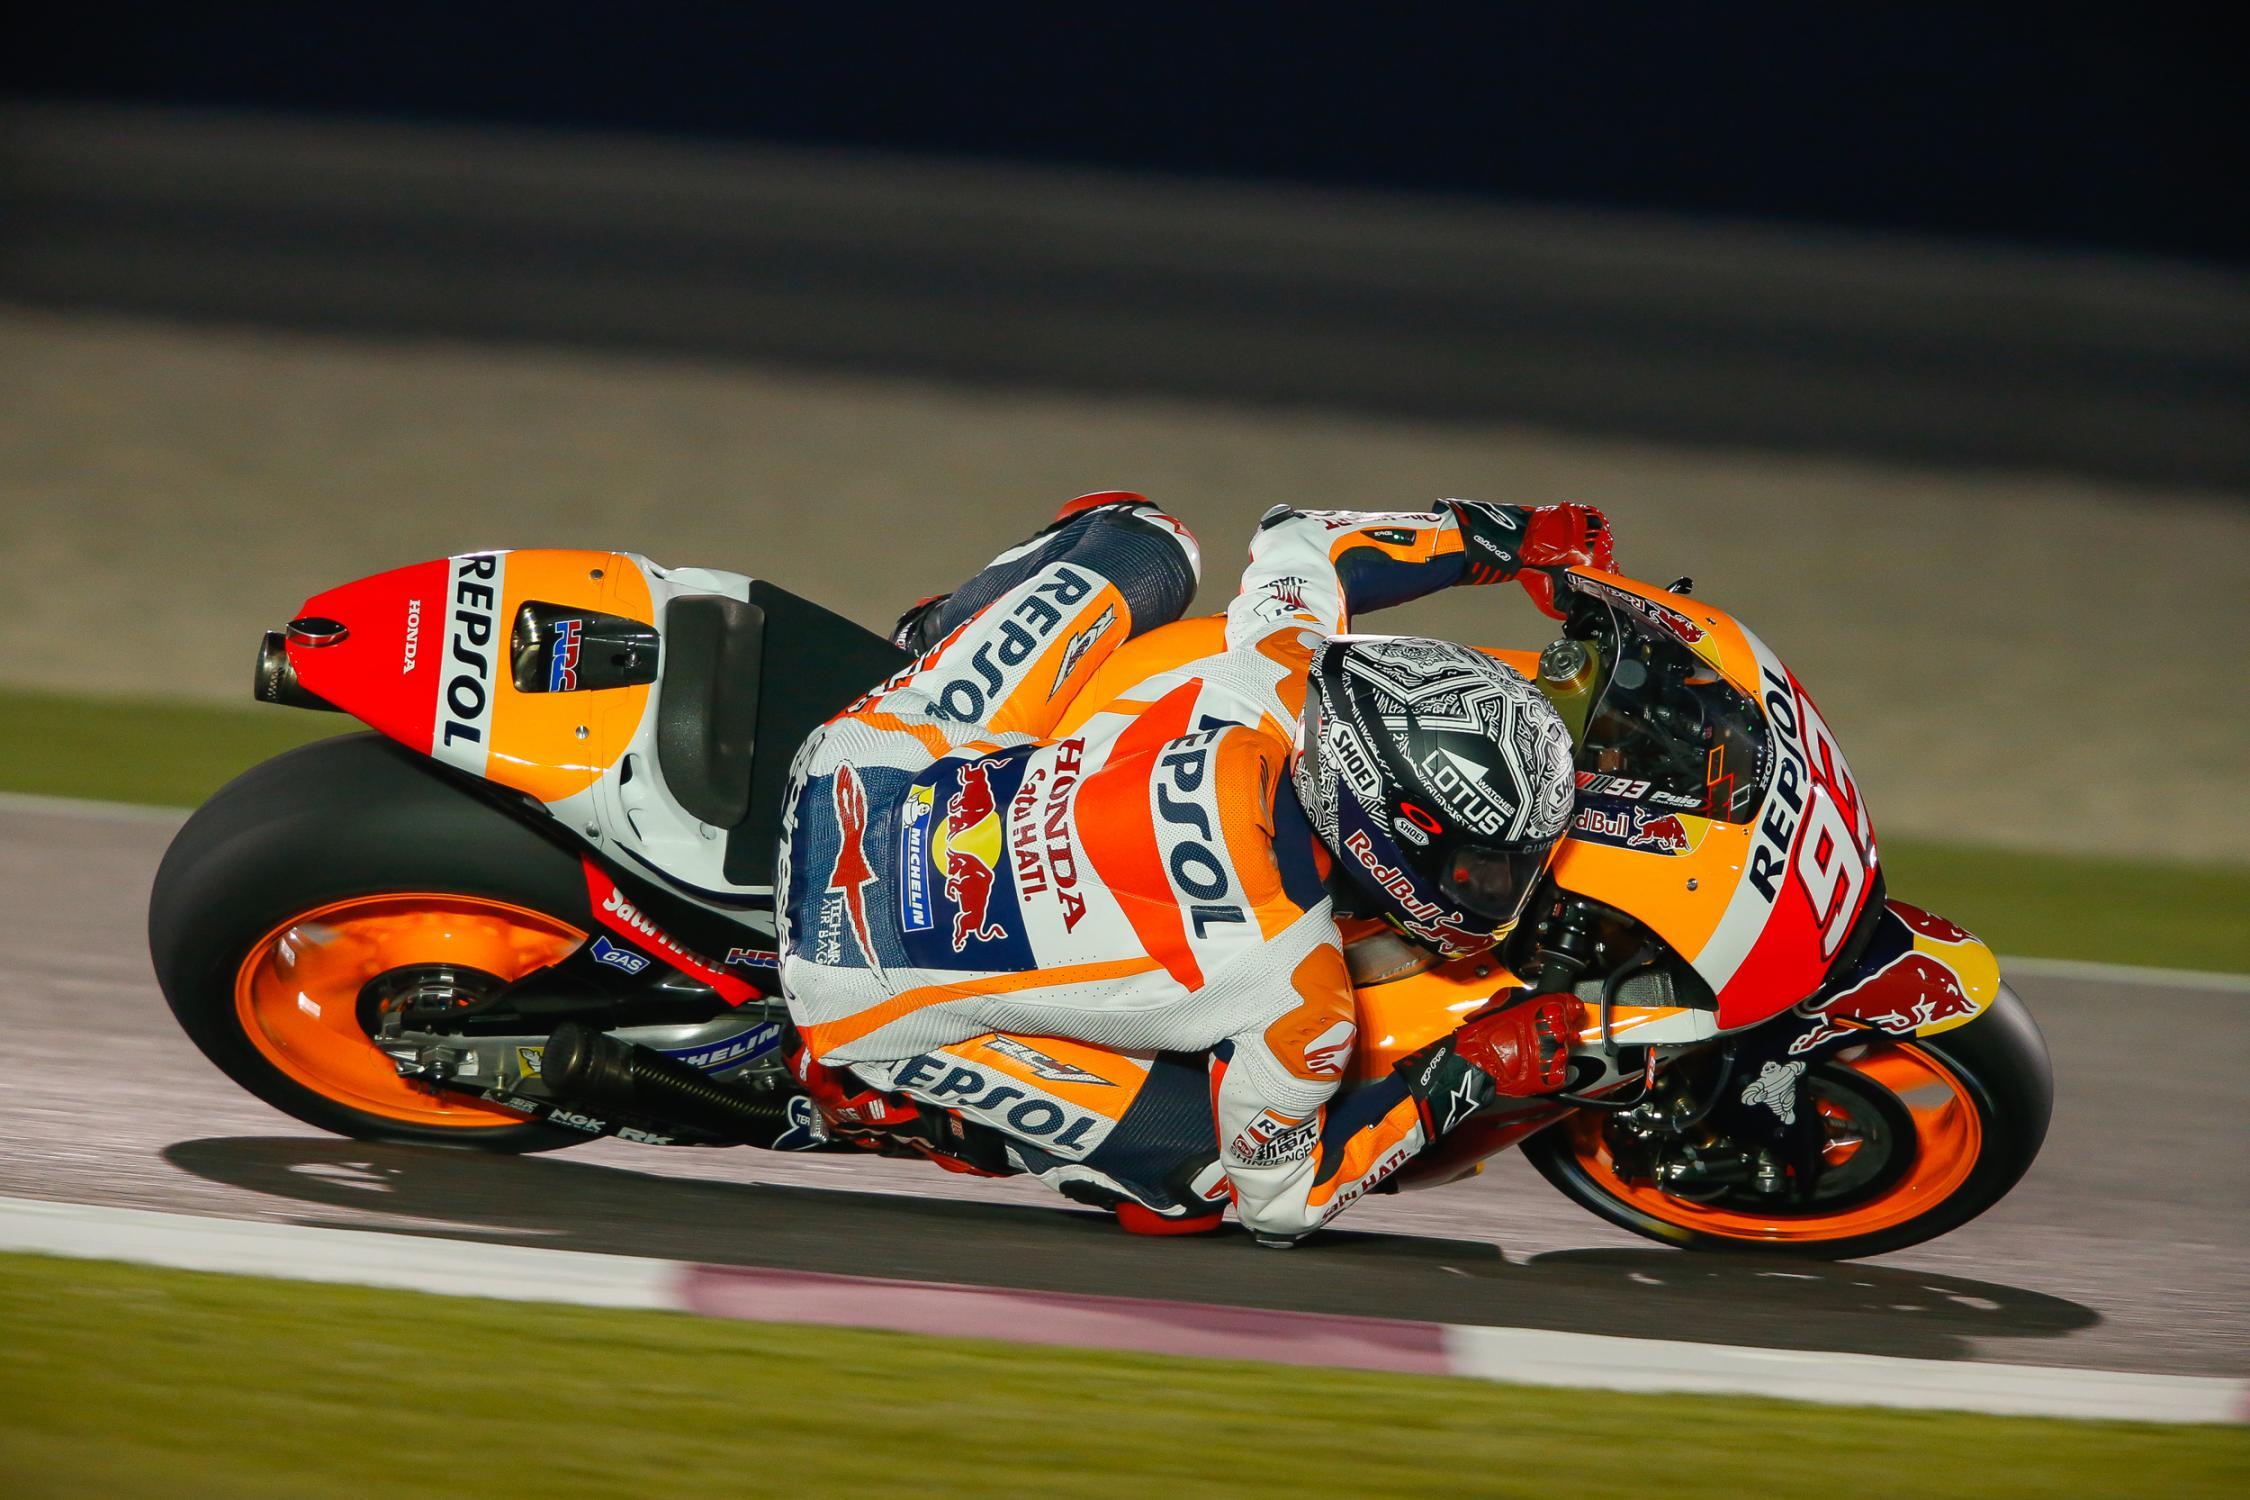 Test MotoGP Qatar 2016 93-marquez_gp_4911.gallery_full_top_fullscreen